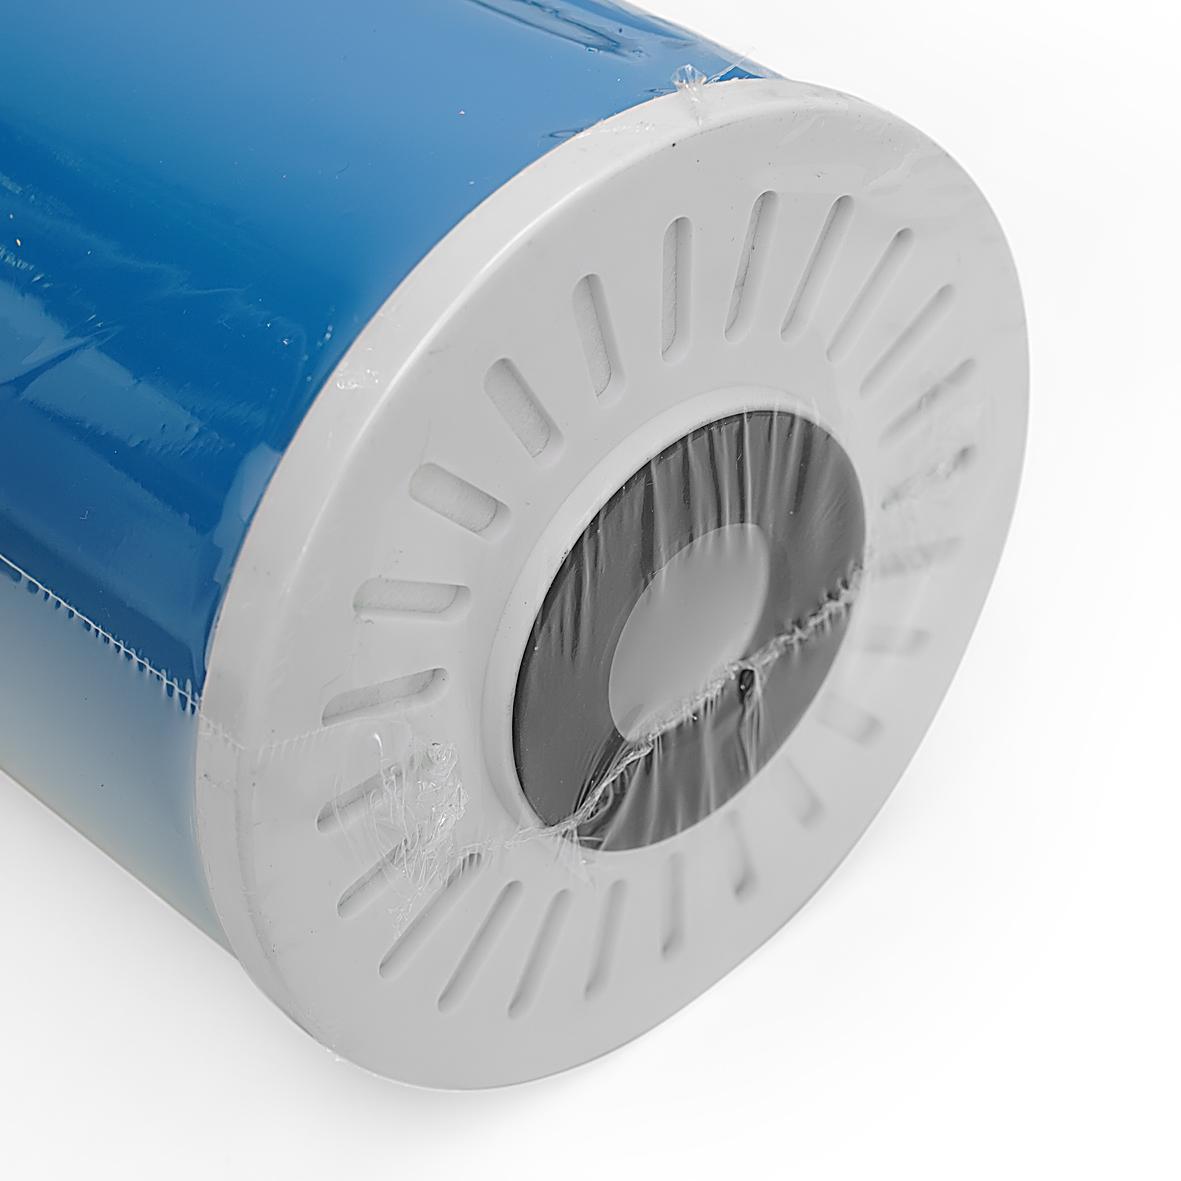 Bộ Ly lọc, cốc lọc Bigblue 20 inch SMY (lõi lọc UDF)